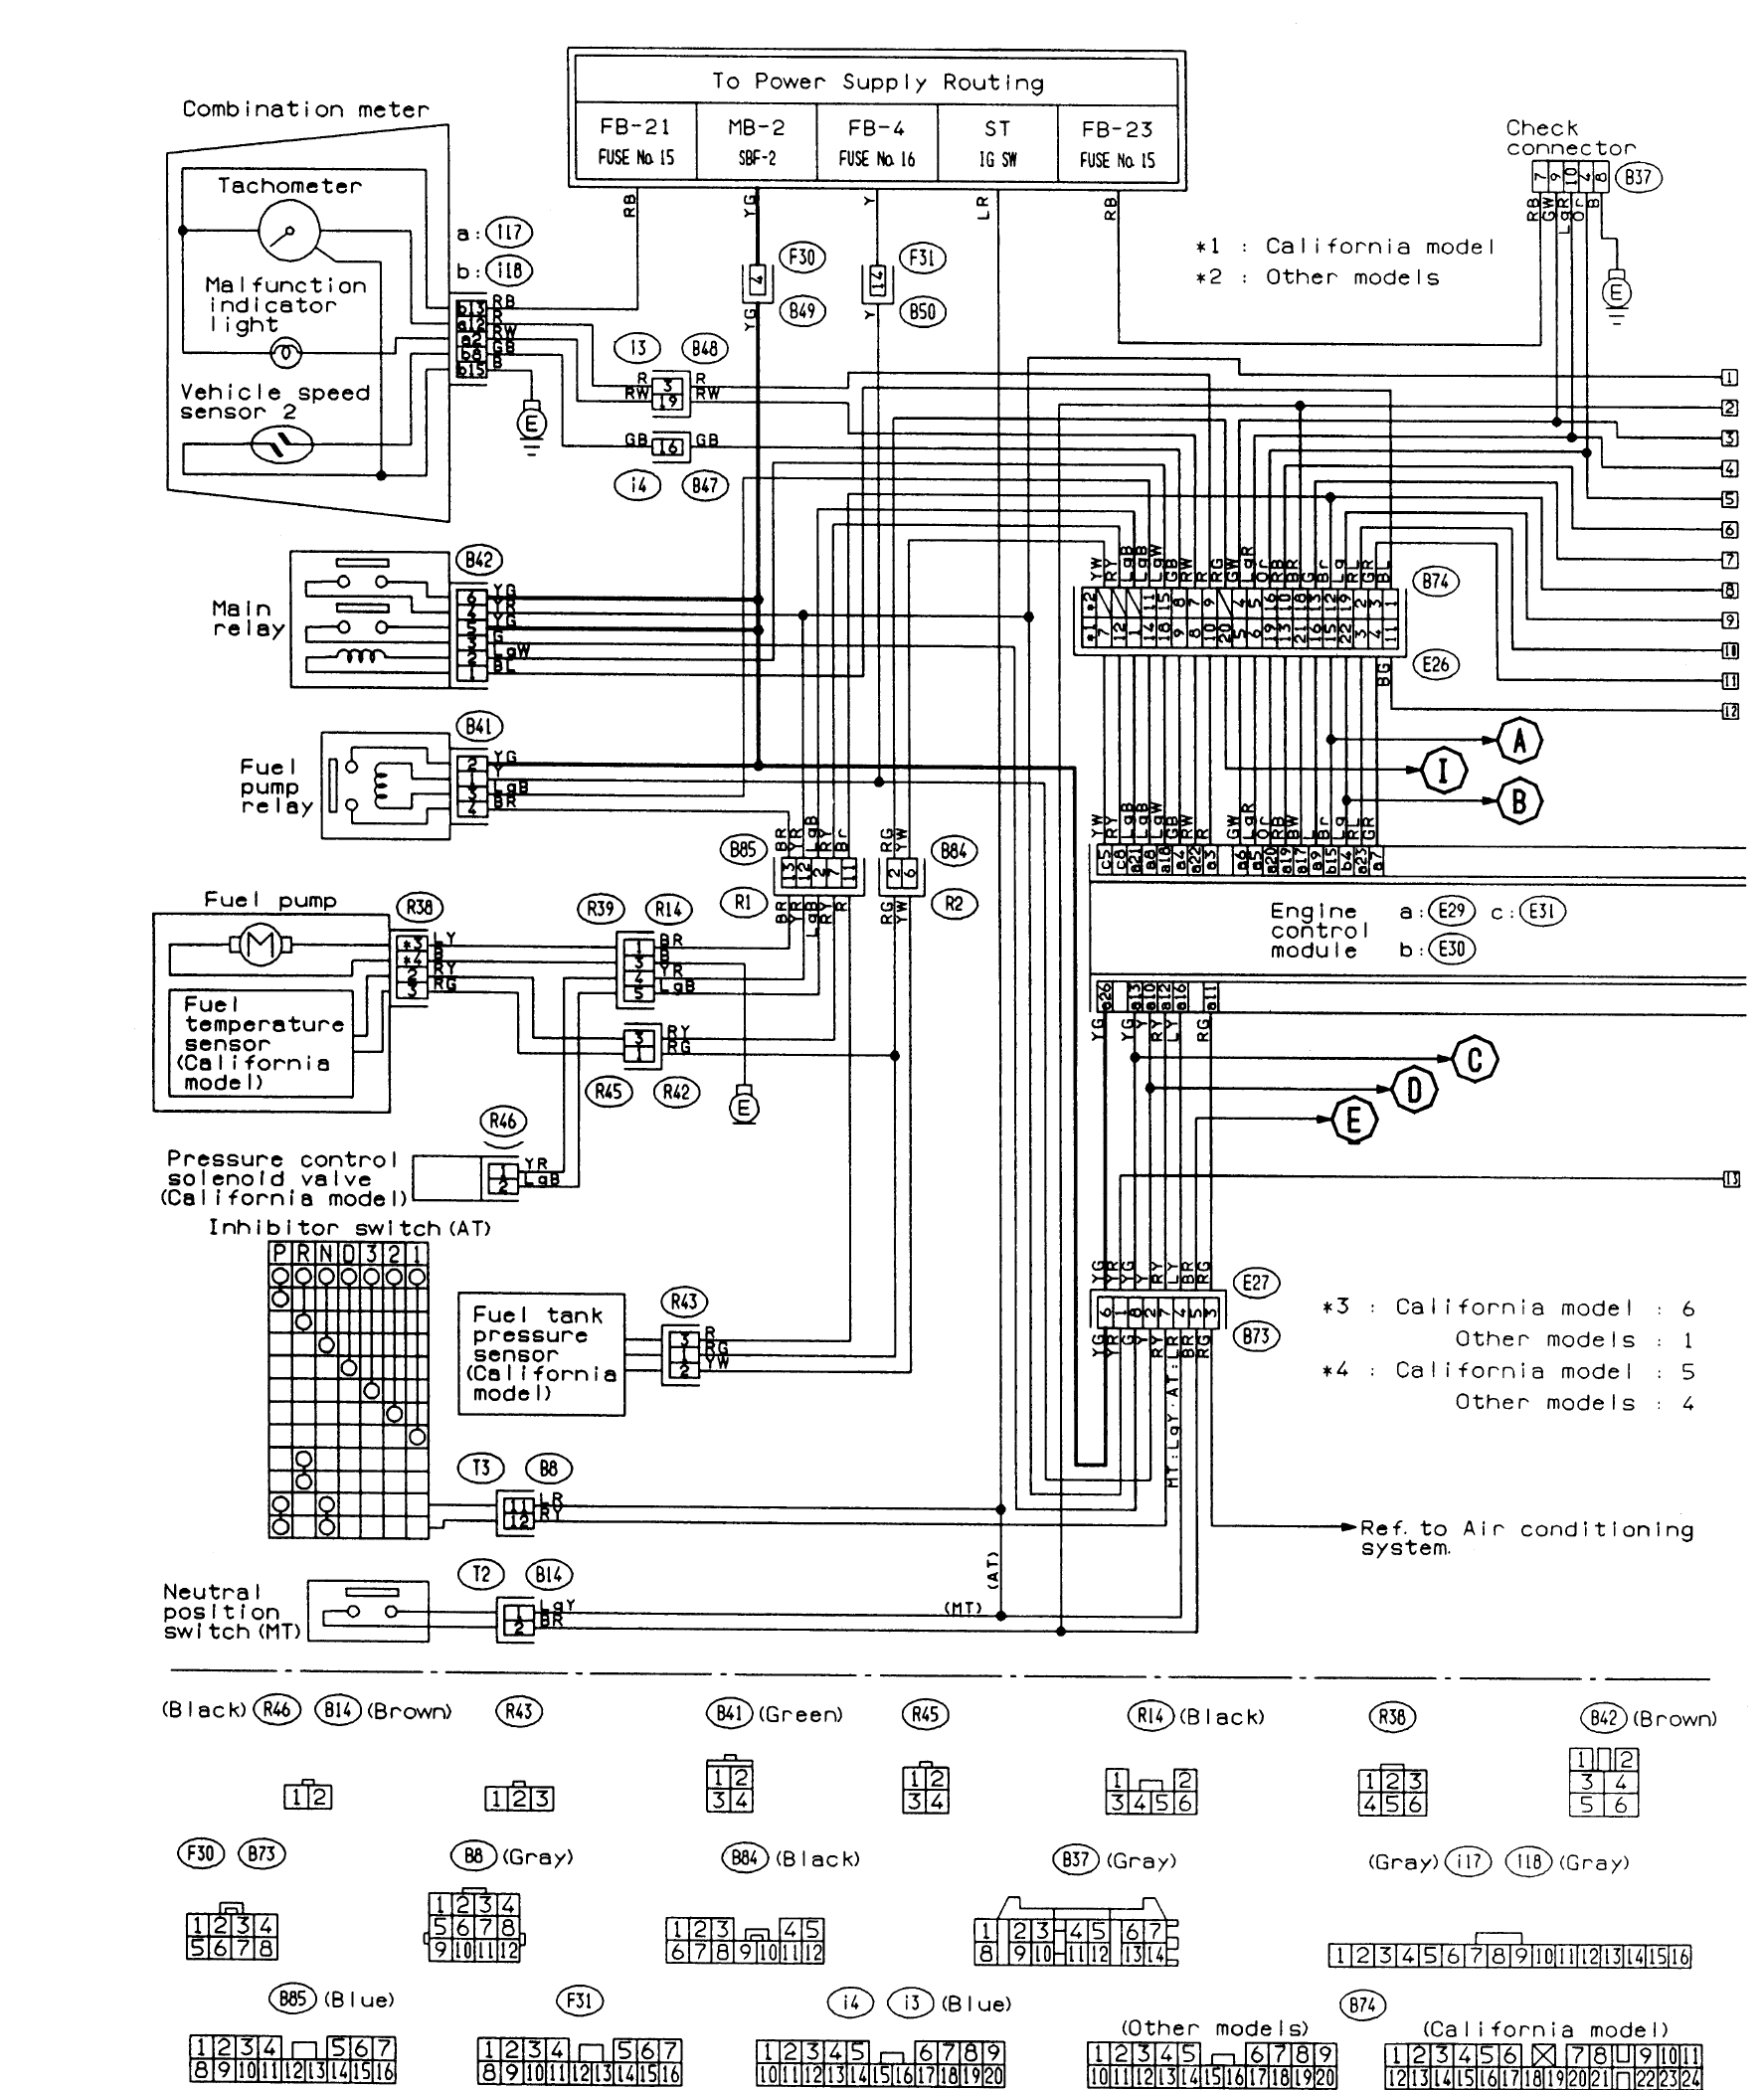 2011 subaru outback headlight wiring diagram 2001 subaru outback engine wire diagram wiring diagram data  2001 subaru outback engine wire diagram